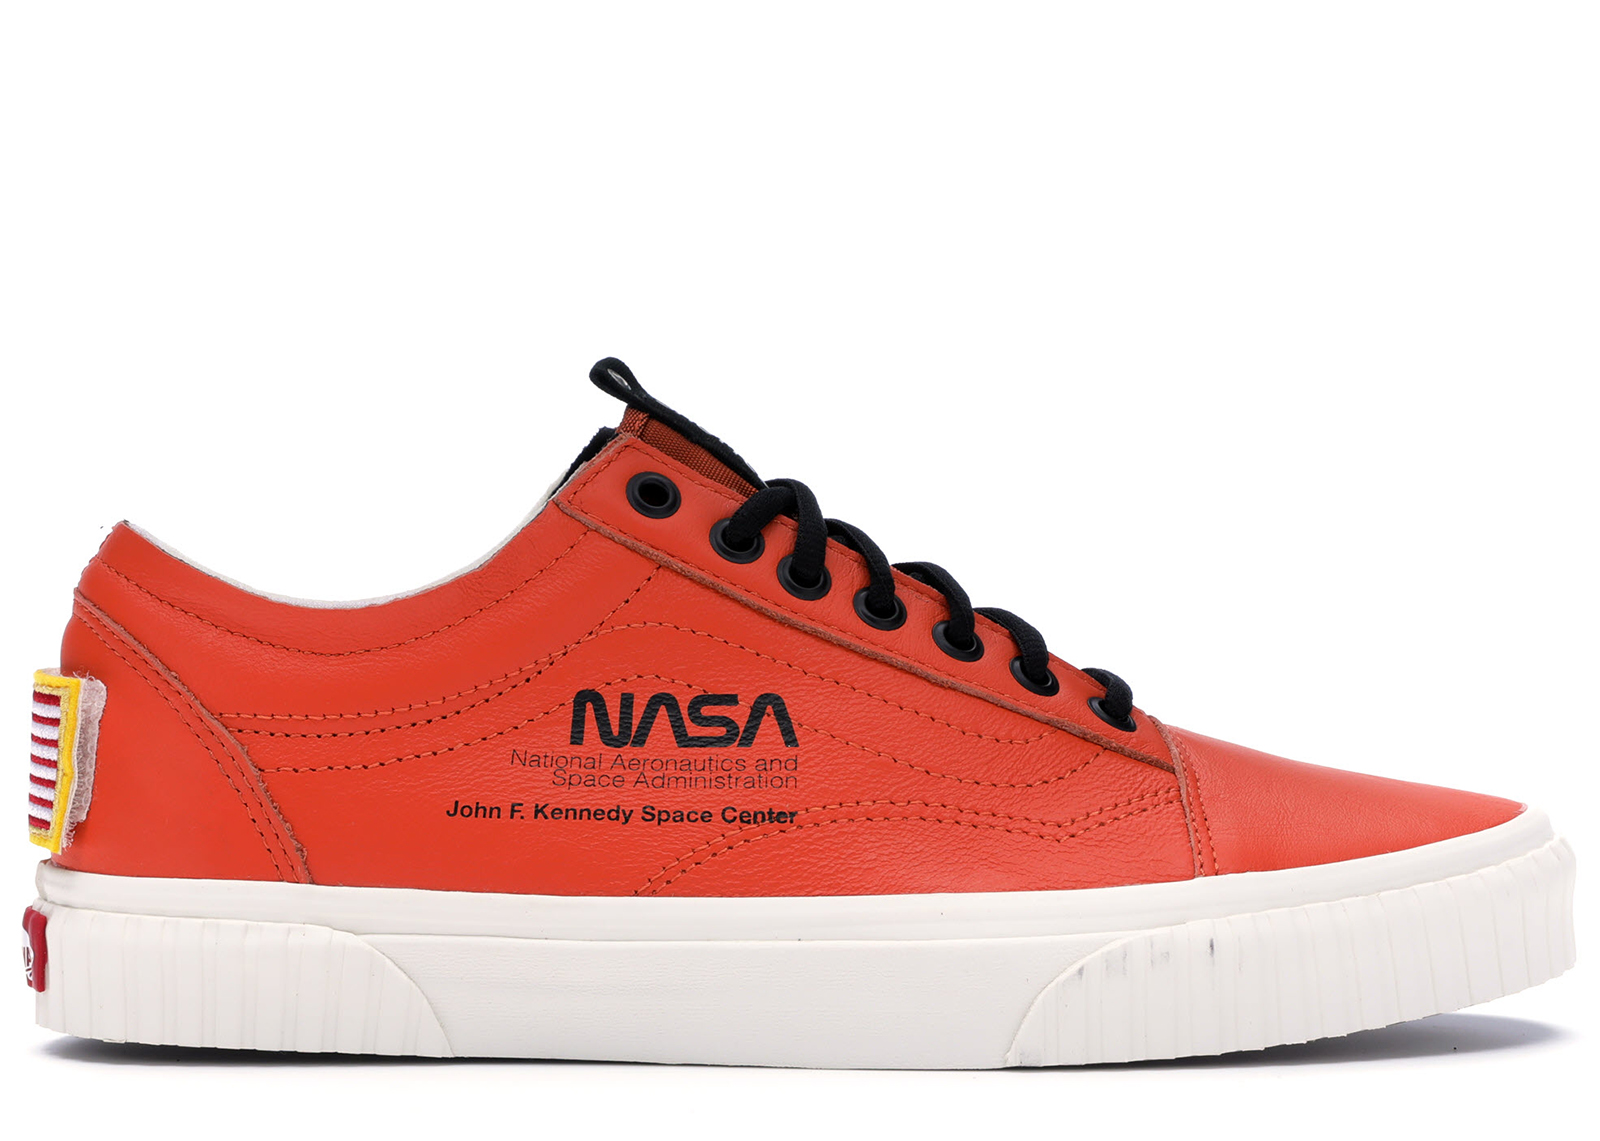 Details about NASA X Vans Space Voyager Old Skool Firecracker Orange Shoes Men's 7.5